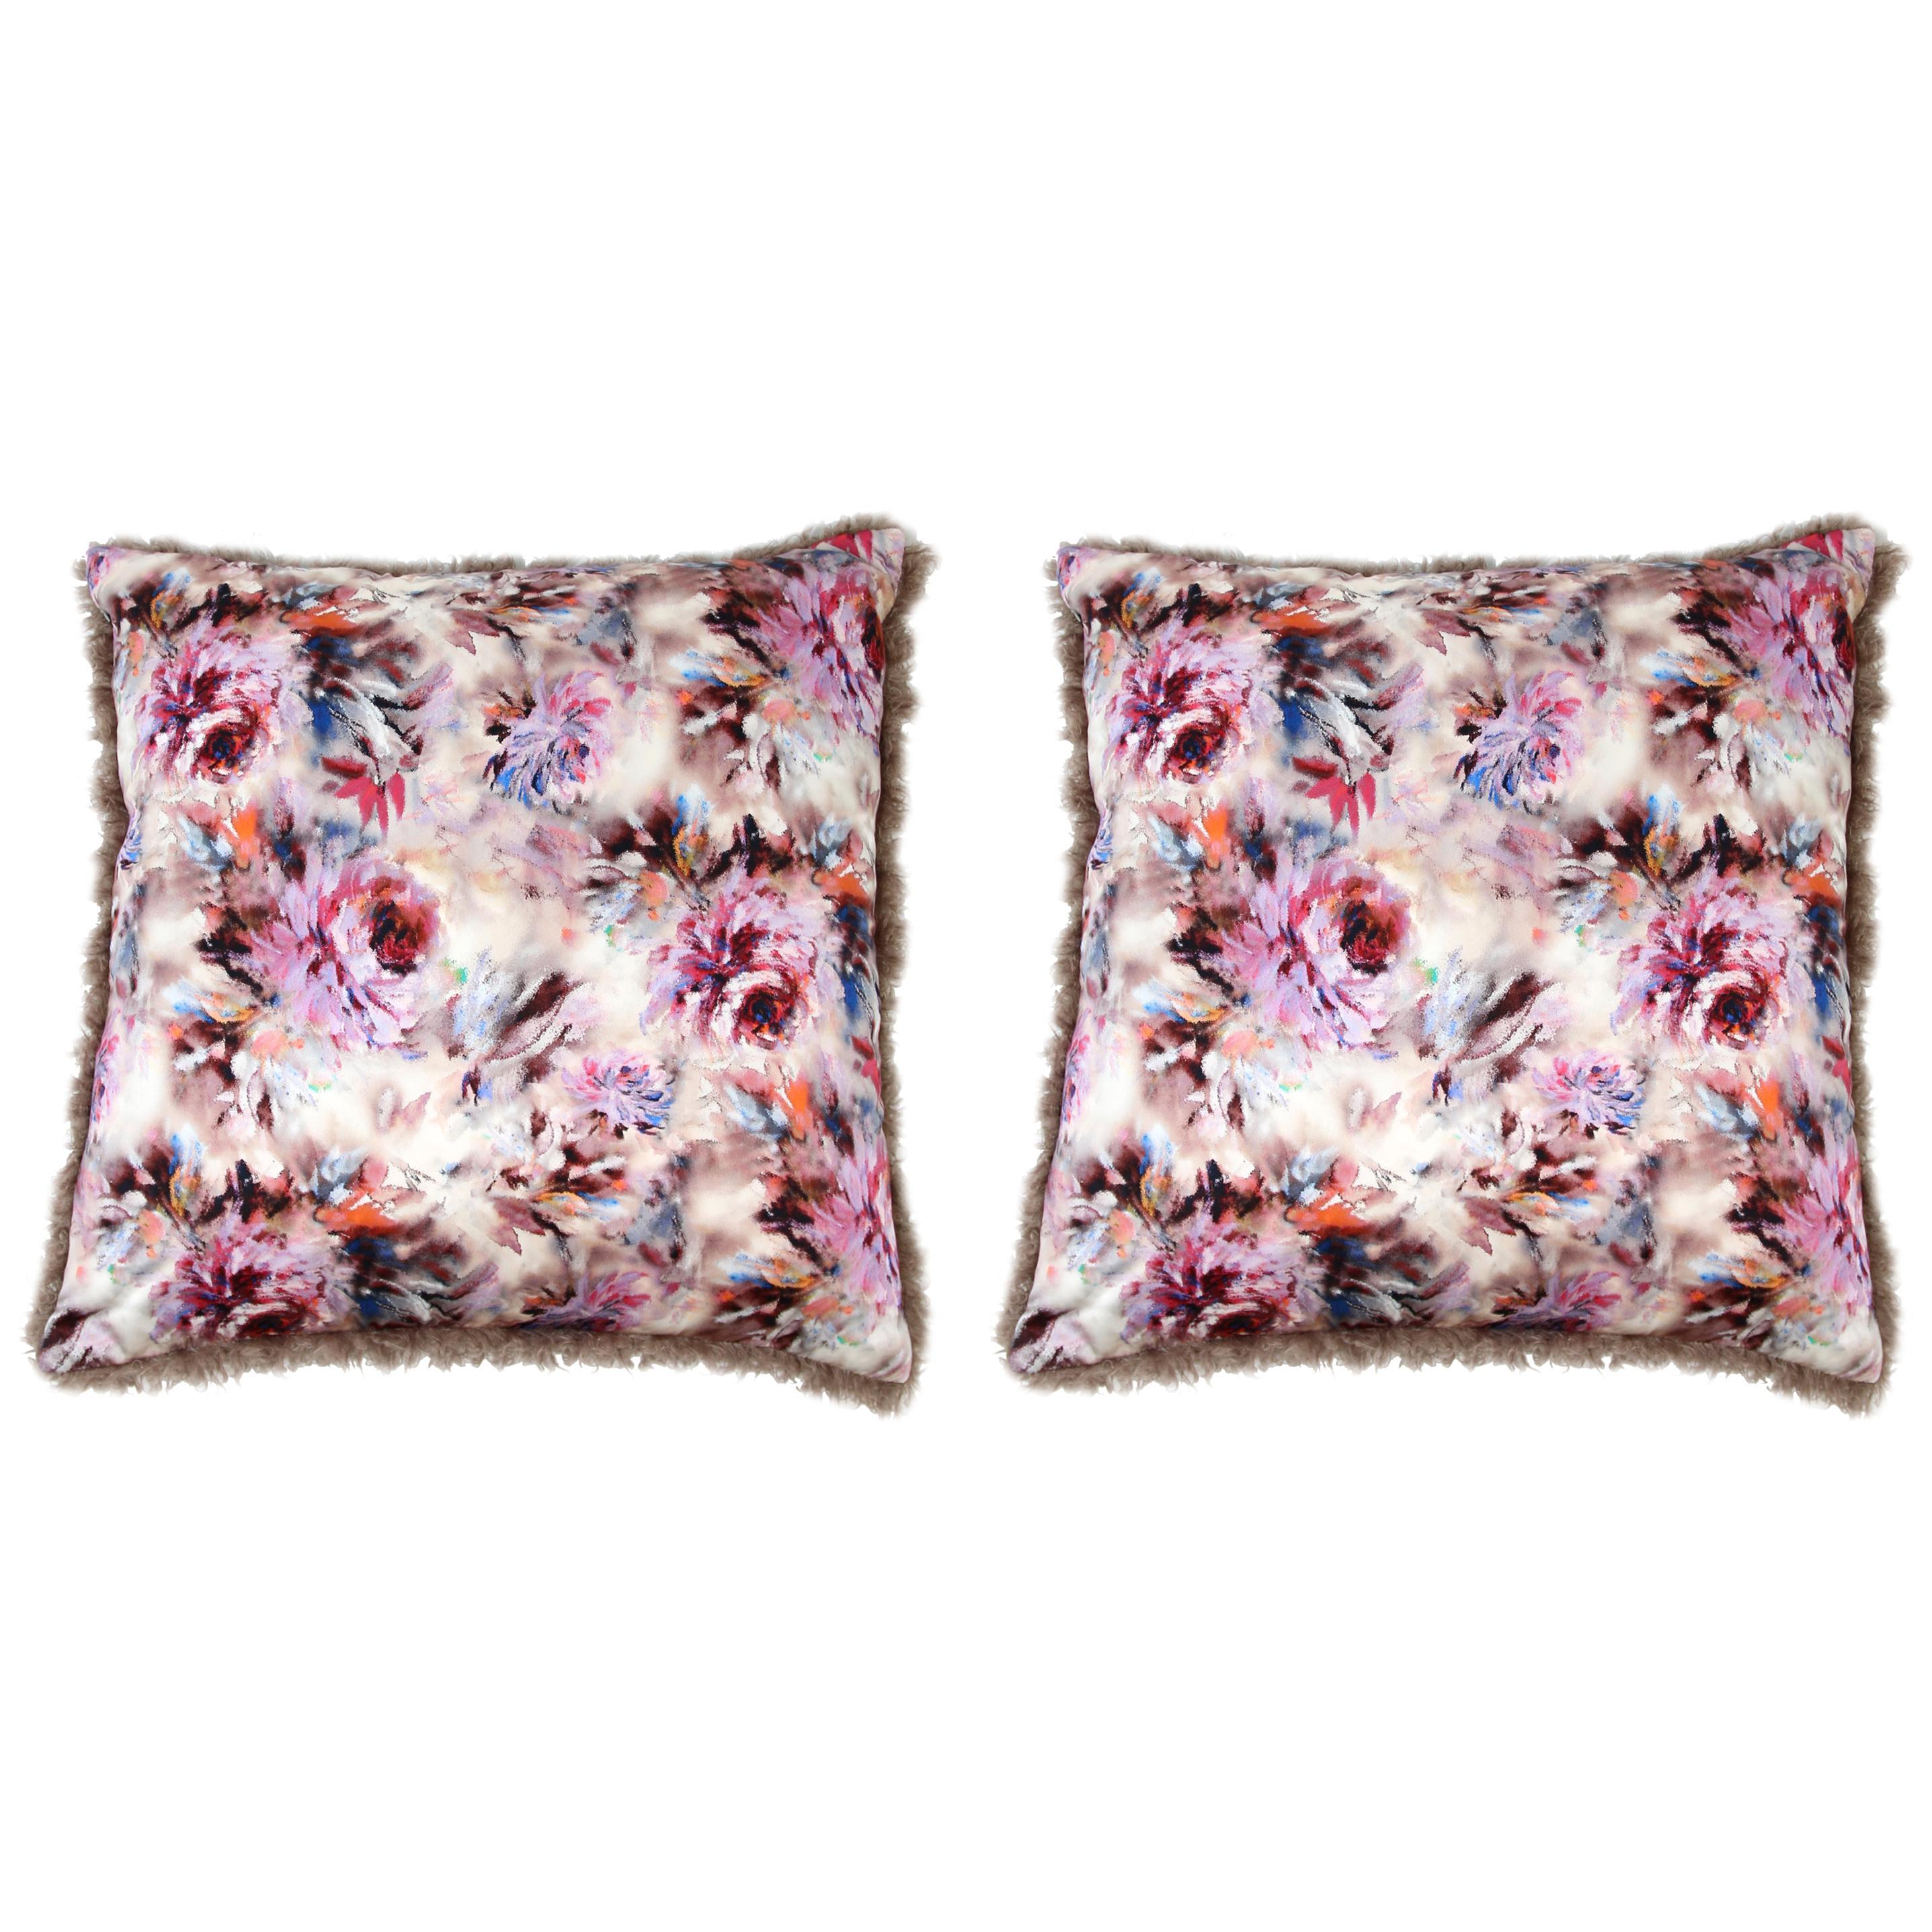 Pelush Mushroom Curly Faux Fur Throw Pillows - Large Boucle' Pillow Set Pair